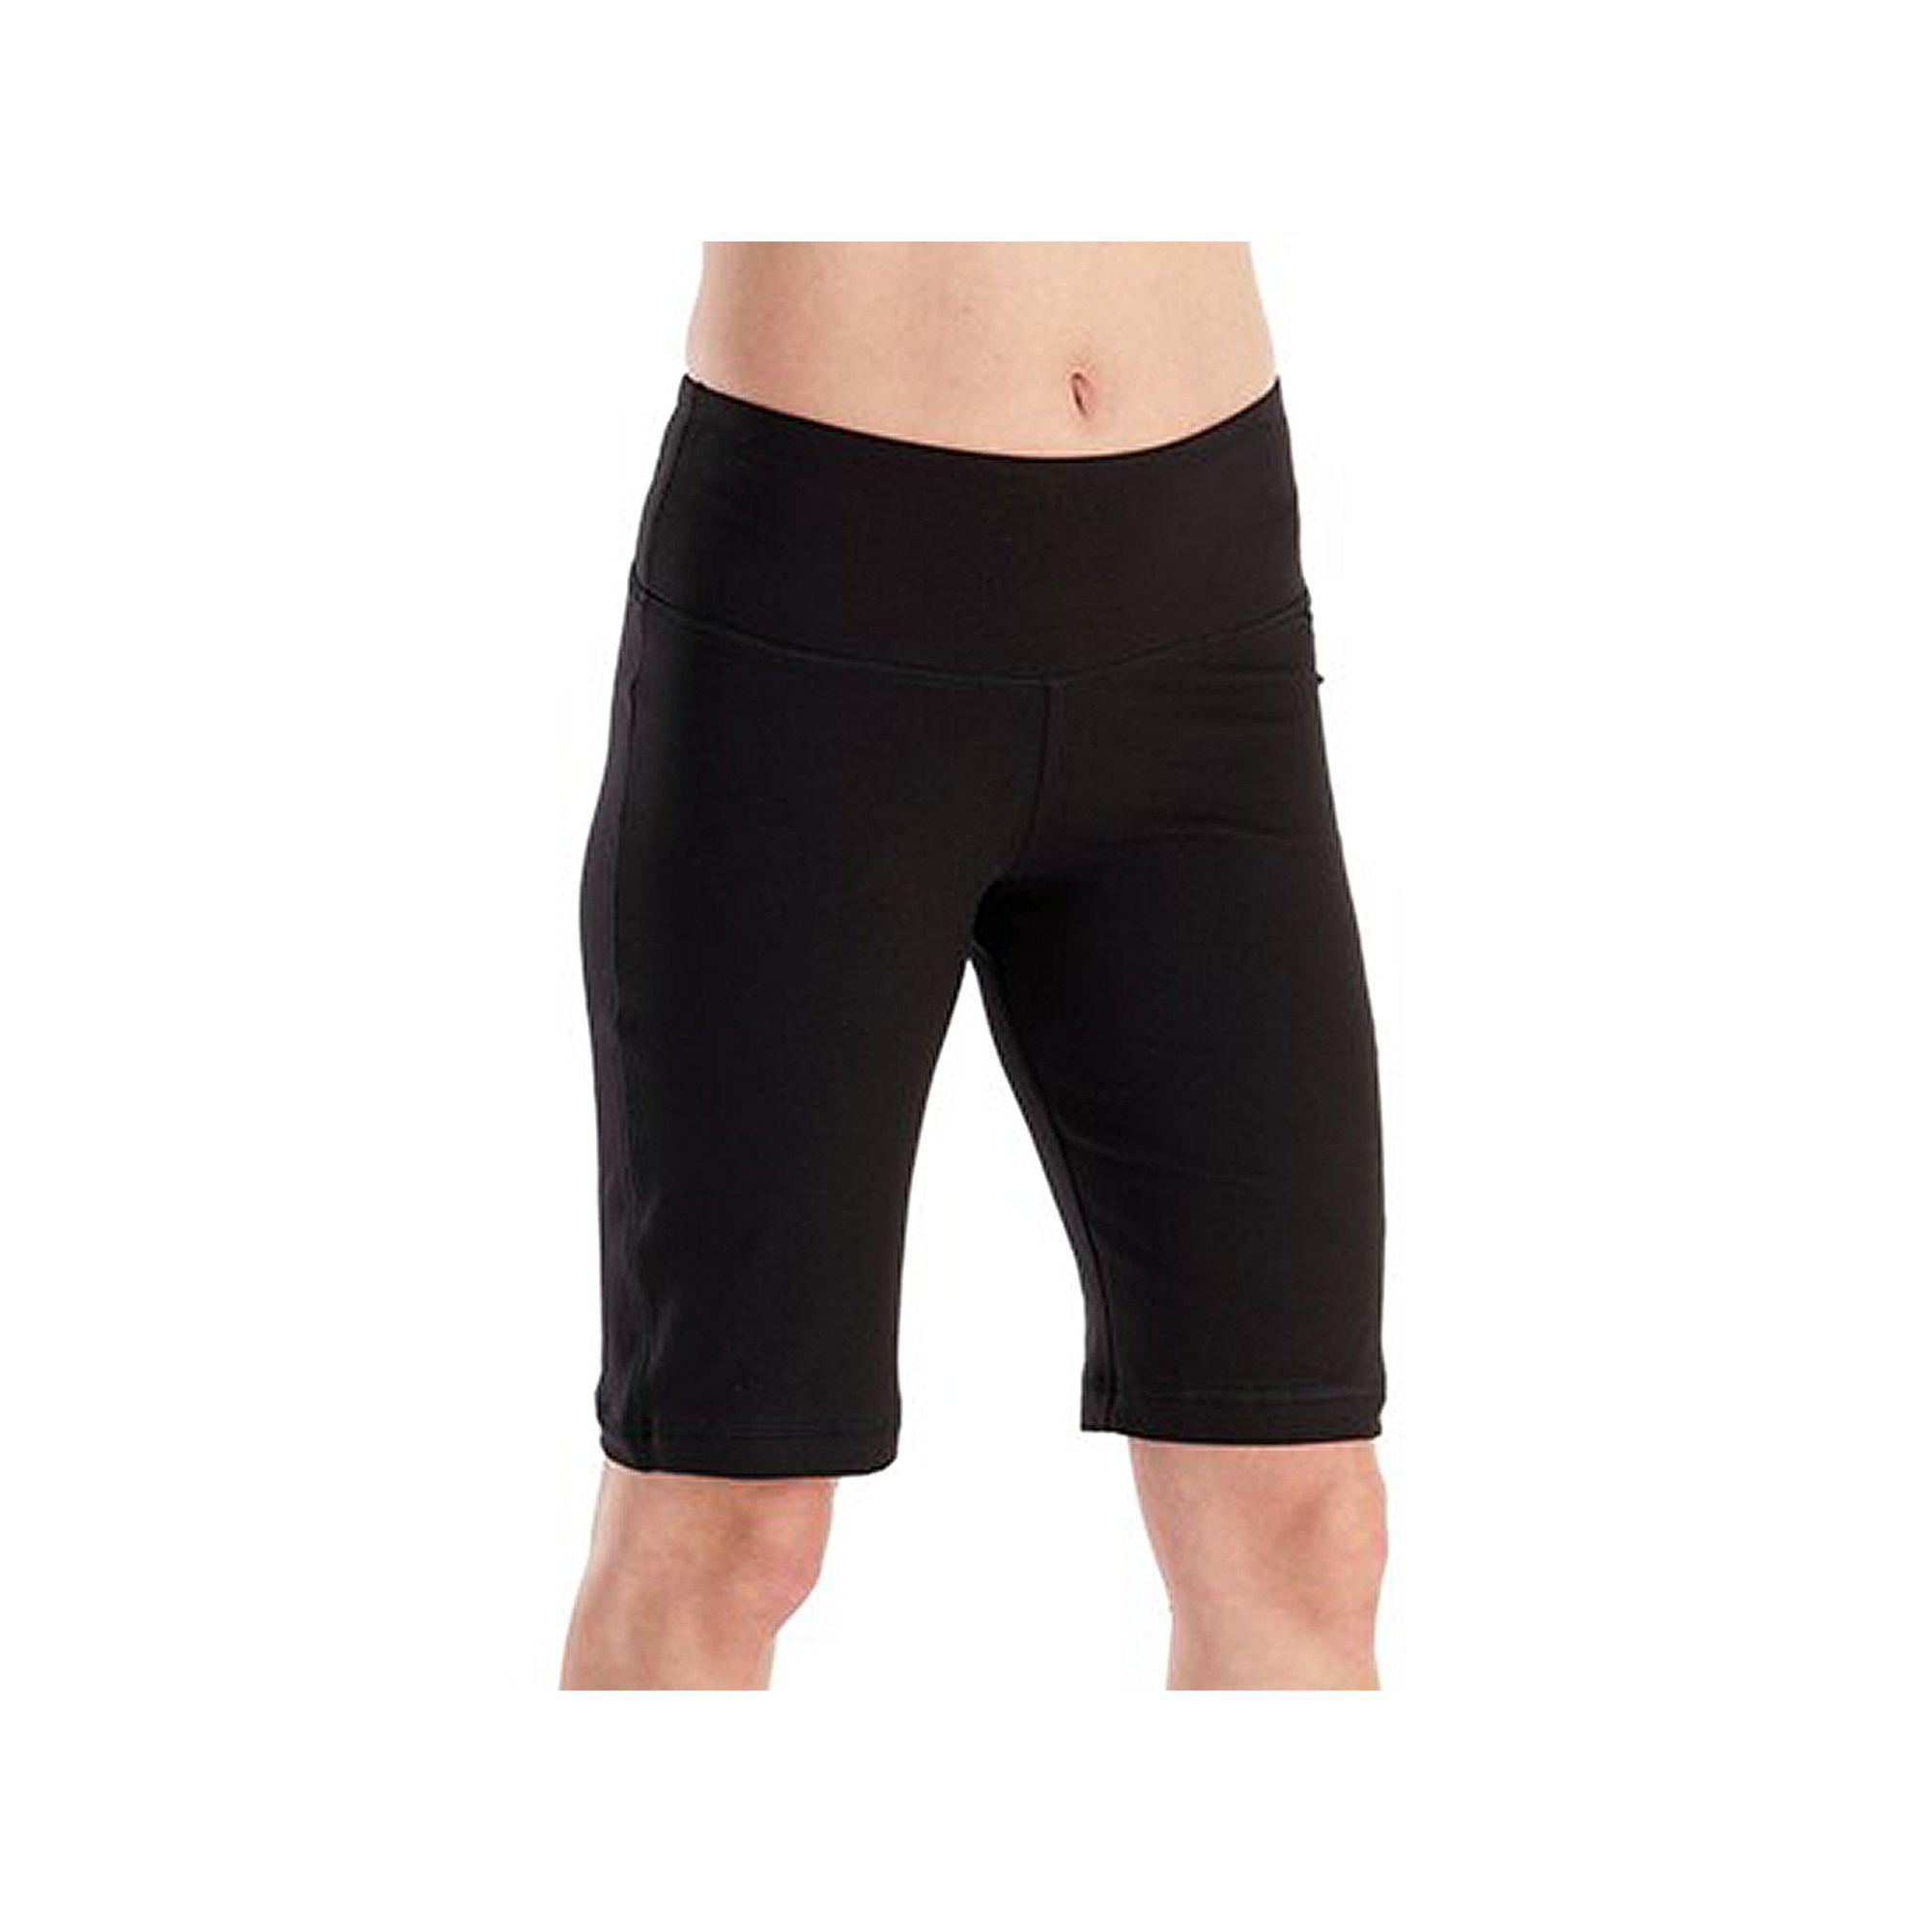 15069ee292d56 Women's Marika Magical Balance Tummy Control Performance Bermuda Shorts,  Size: Medium, Black